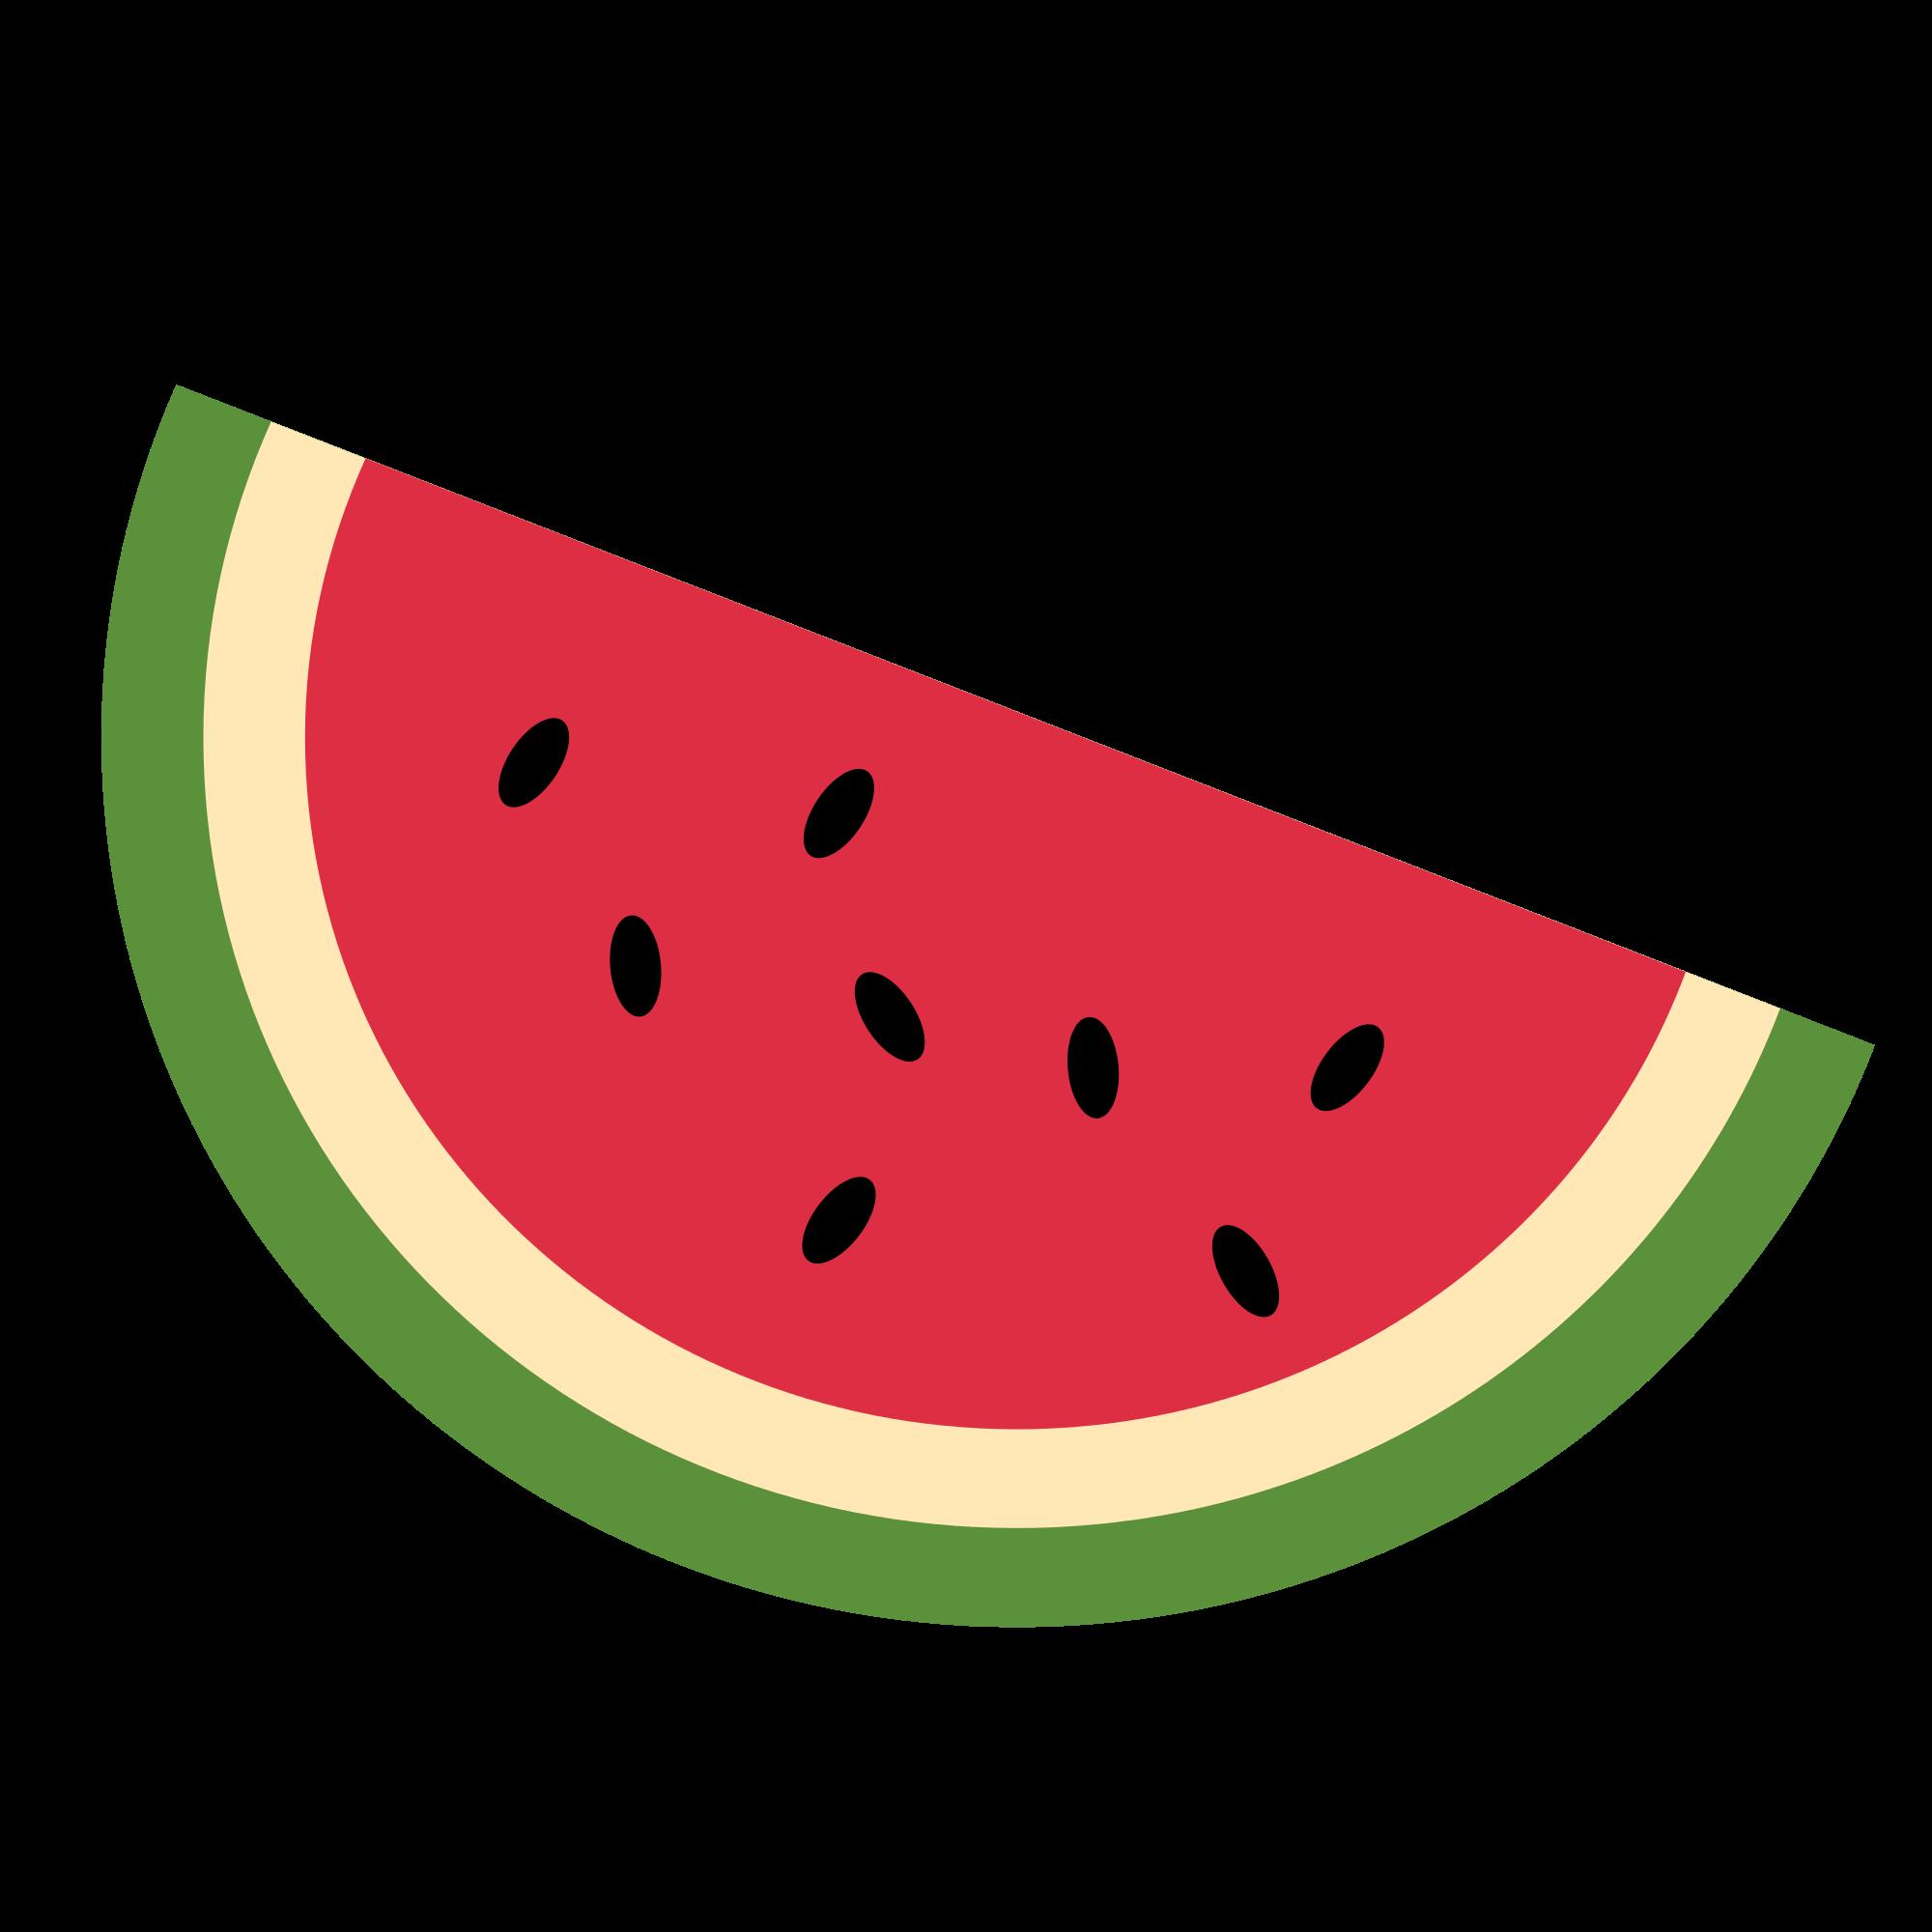 jpg free library watermelon svg file #118801894